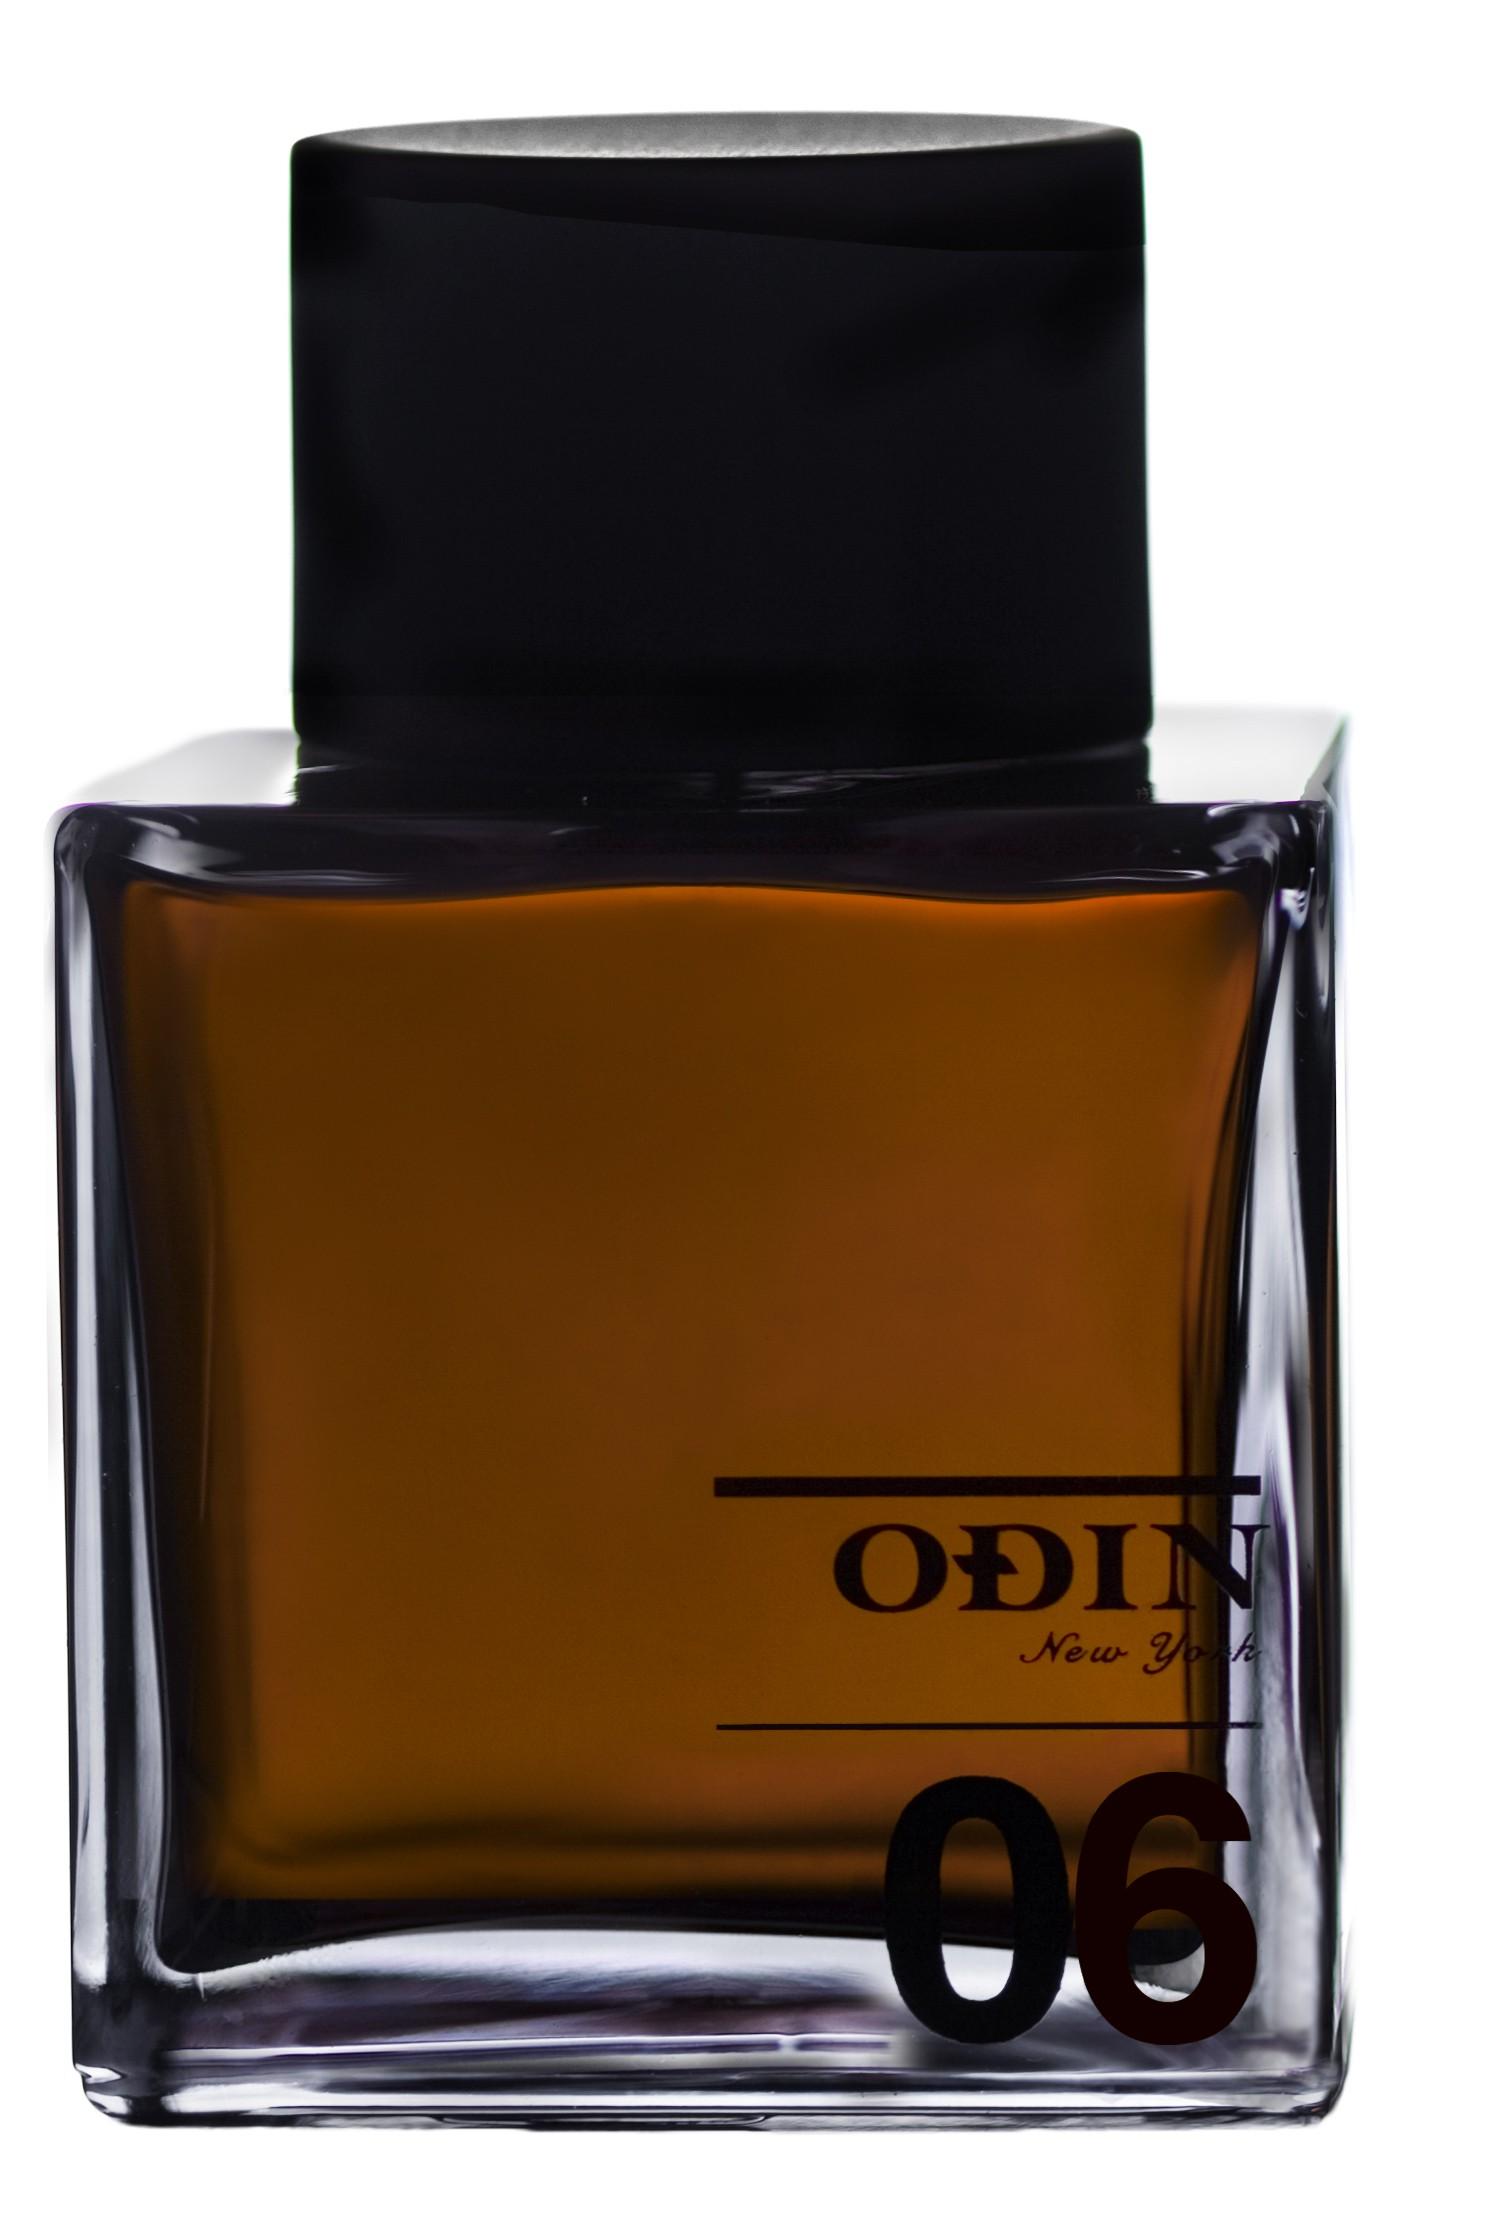 Odin New York 06 Amanu аромат для мужчин и женщин